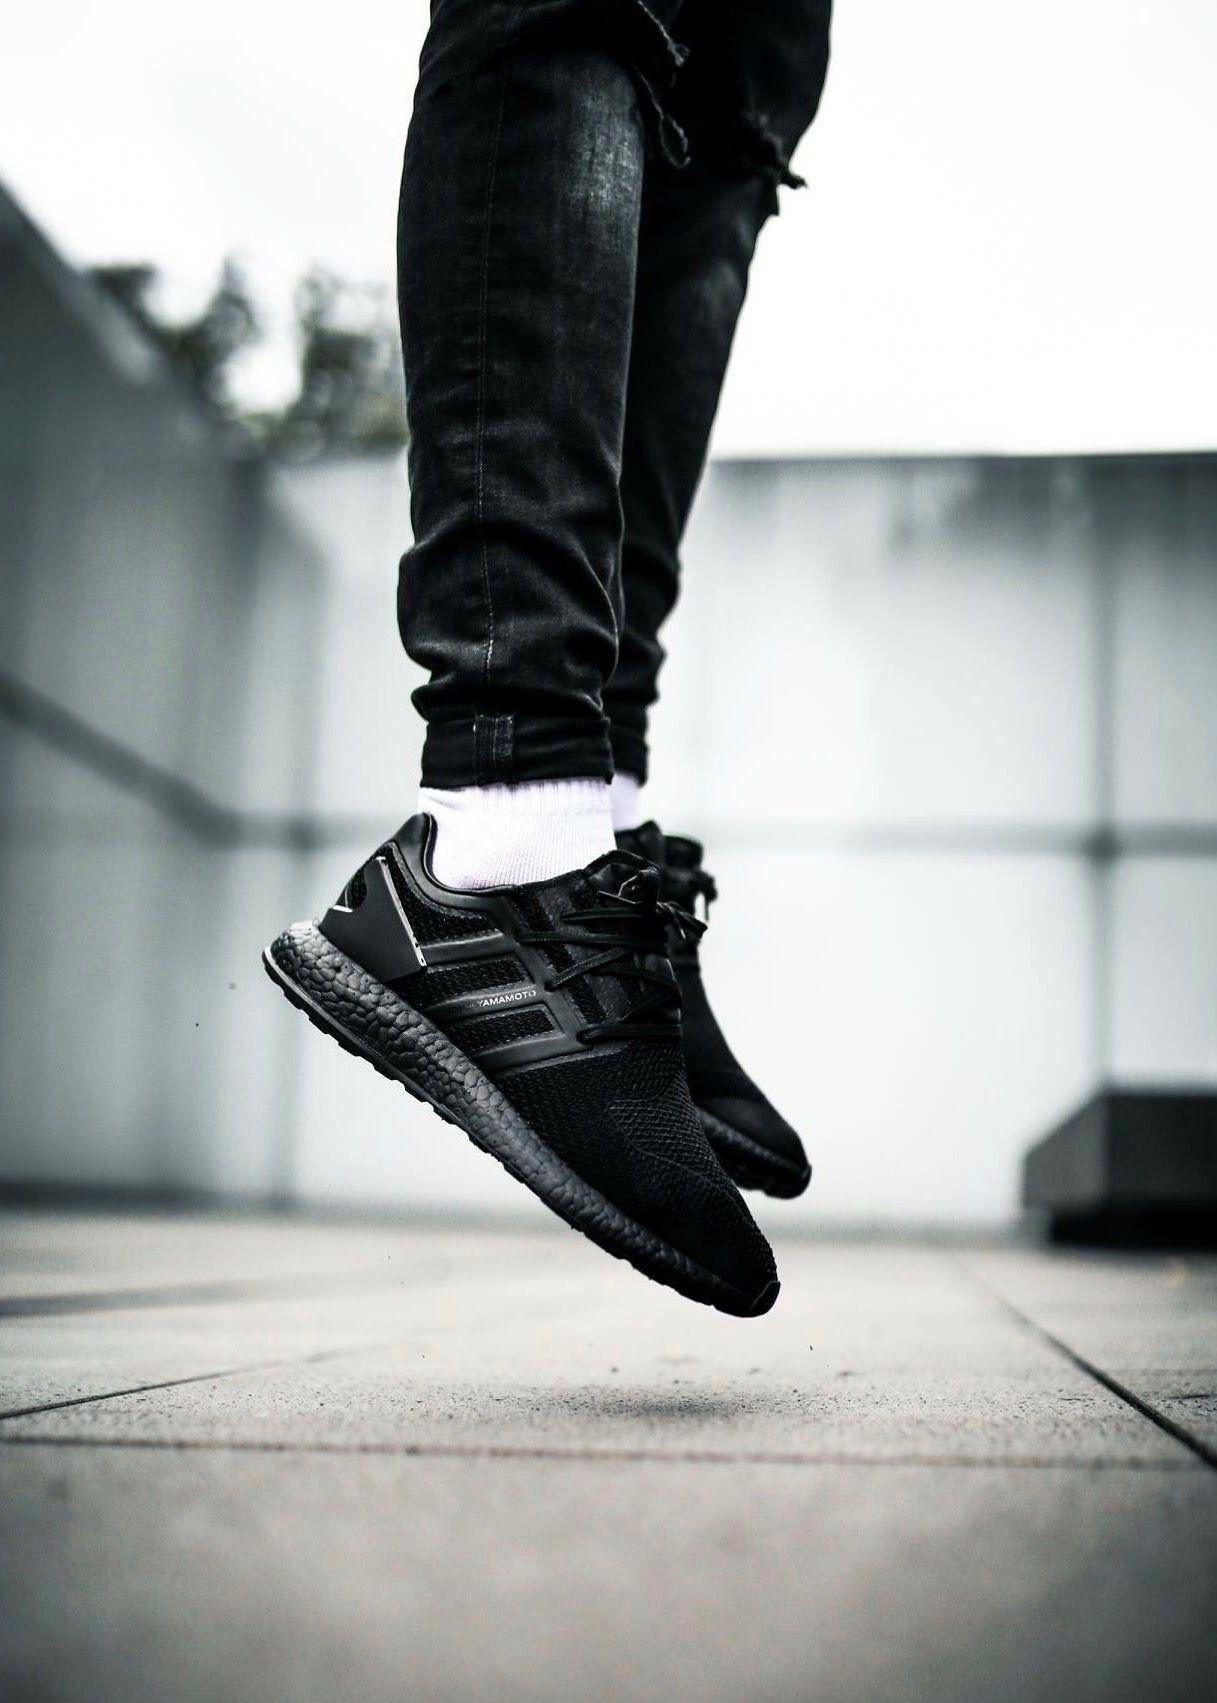 adidas y 3 pure boost triple black